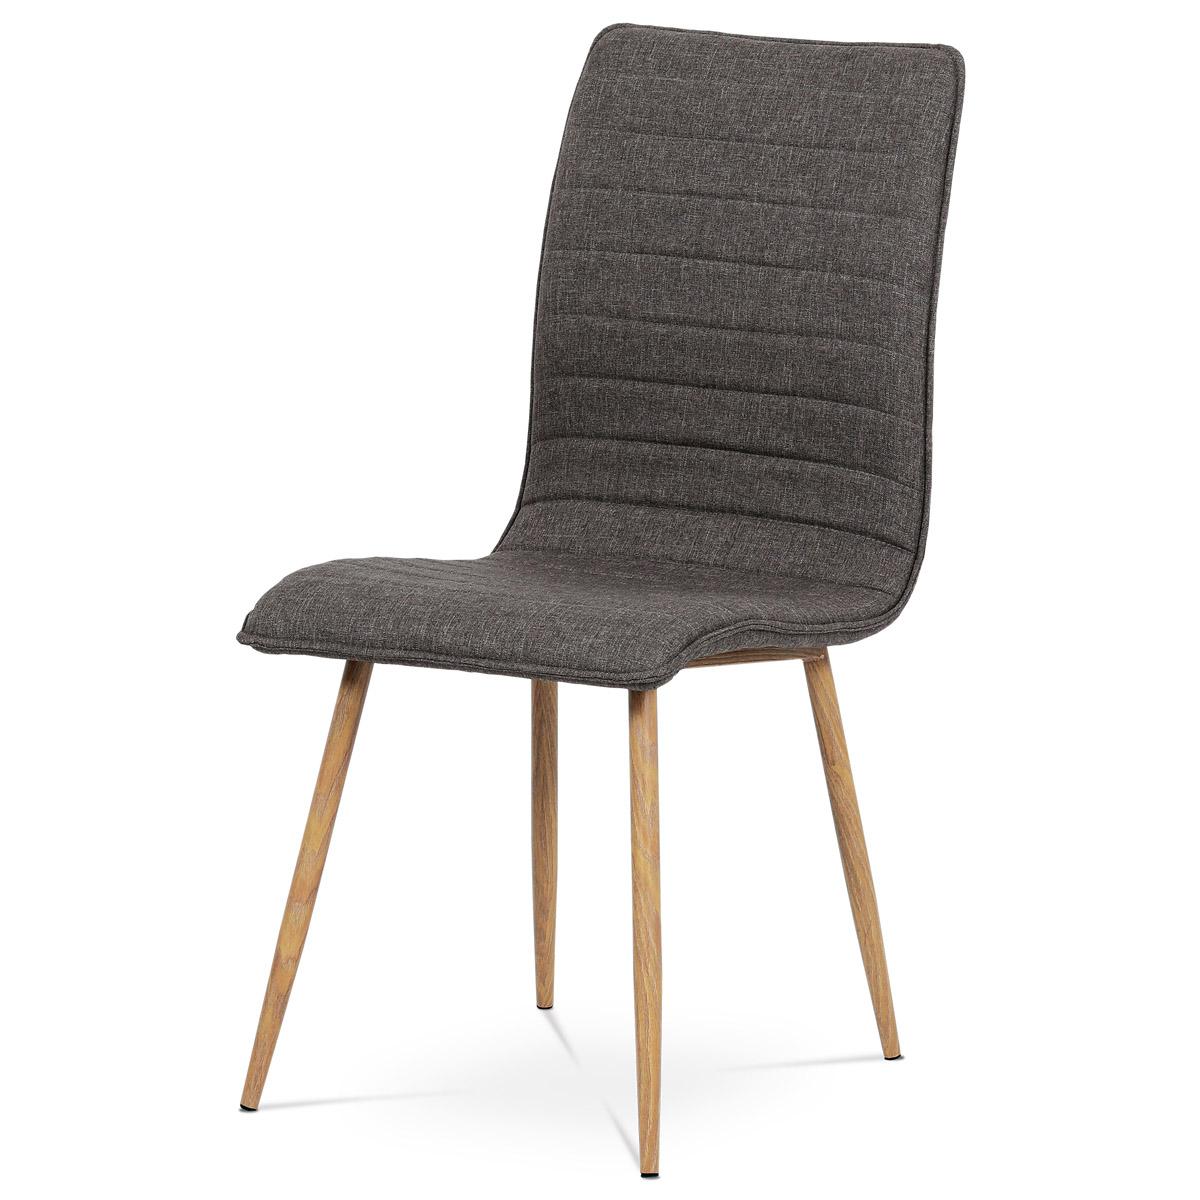 Autronic - Jídelní židle coffee látka / kov (dekor dub) - HC-368 COF2